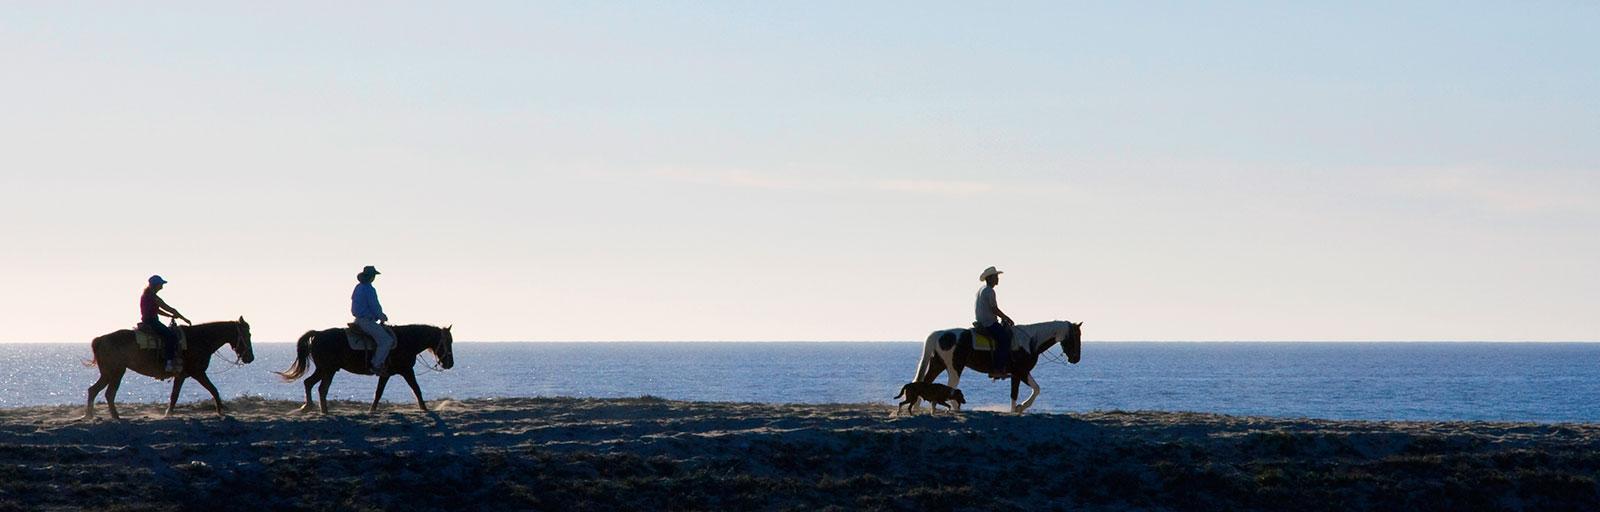 Horseback Riding & Yoga Retreat in Mexico: Walking the Dune